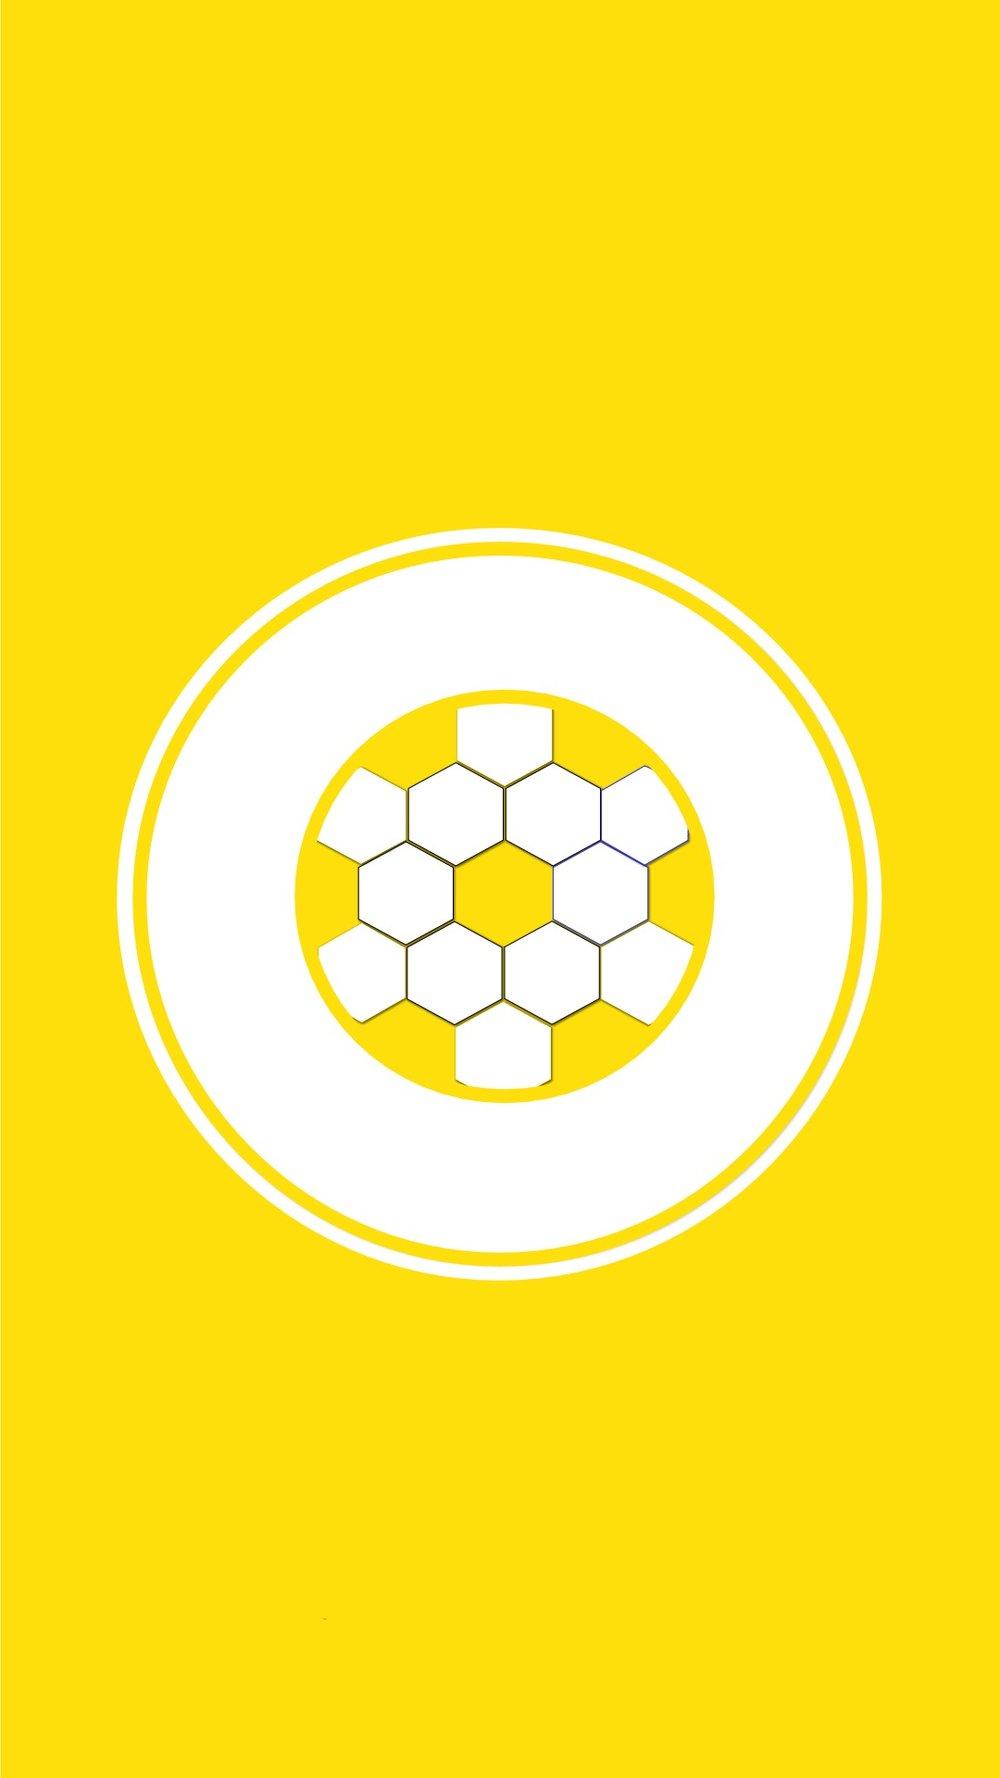 Instagram-cover-ball-yellow-lotnotes.com.jpg